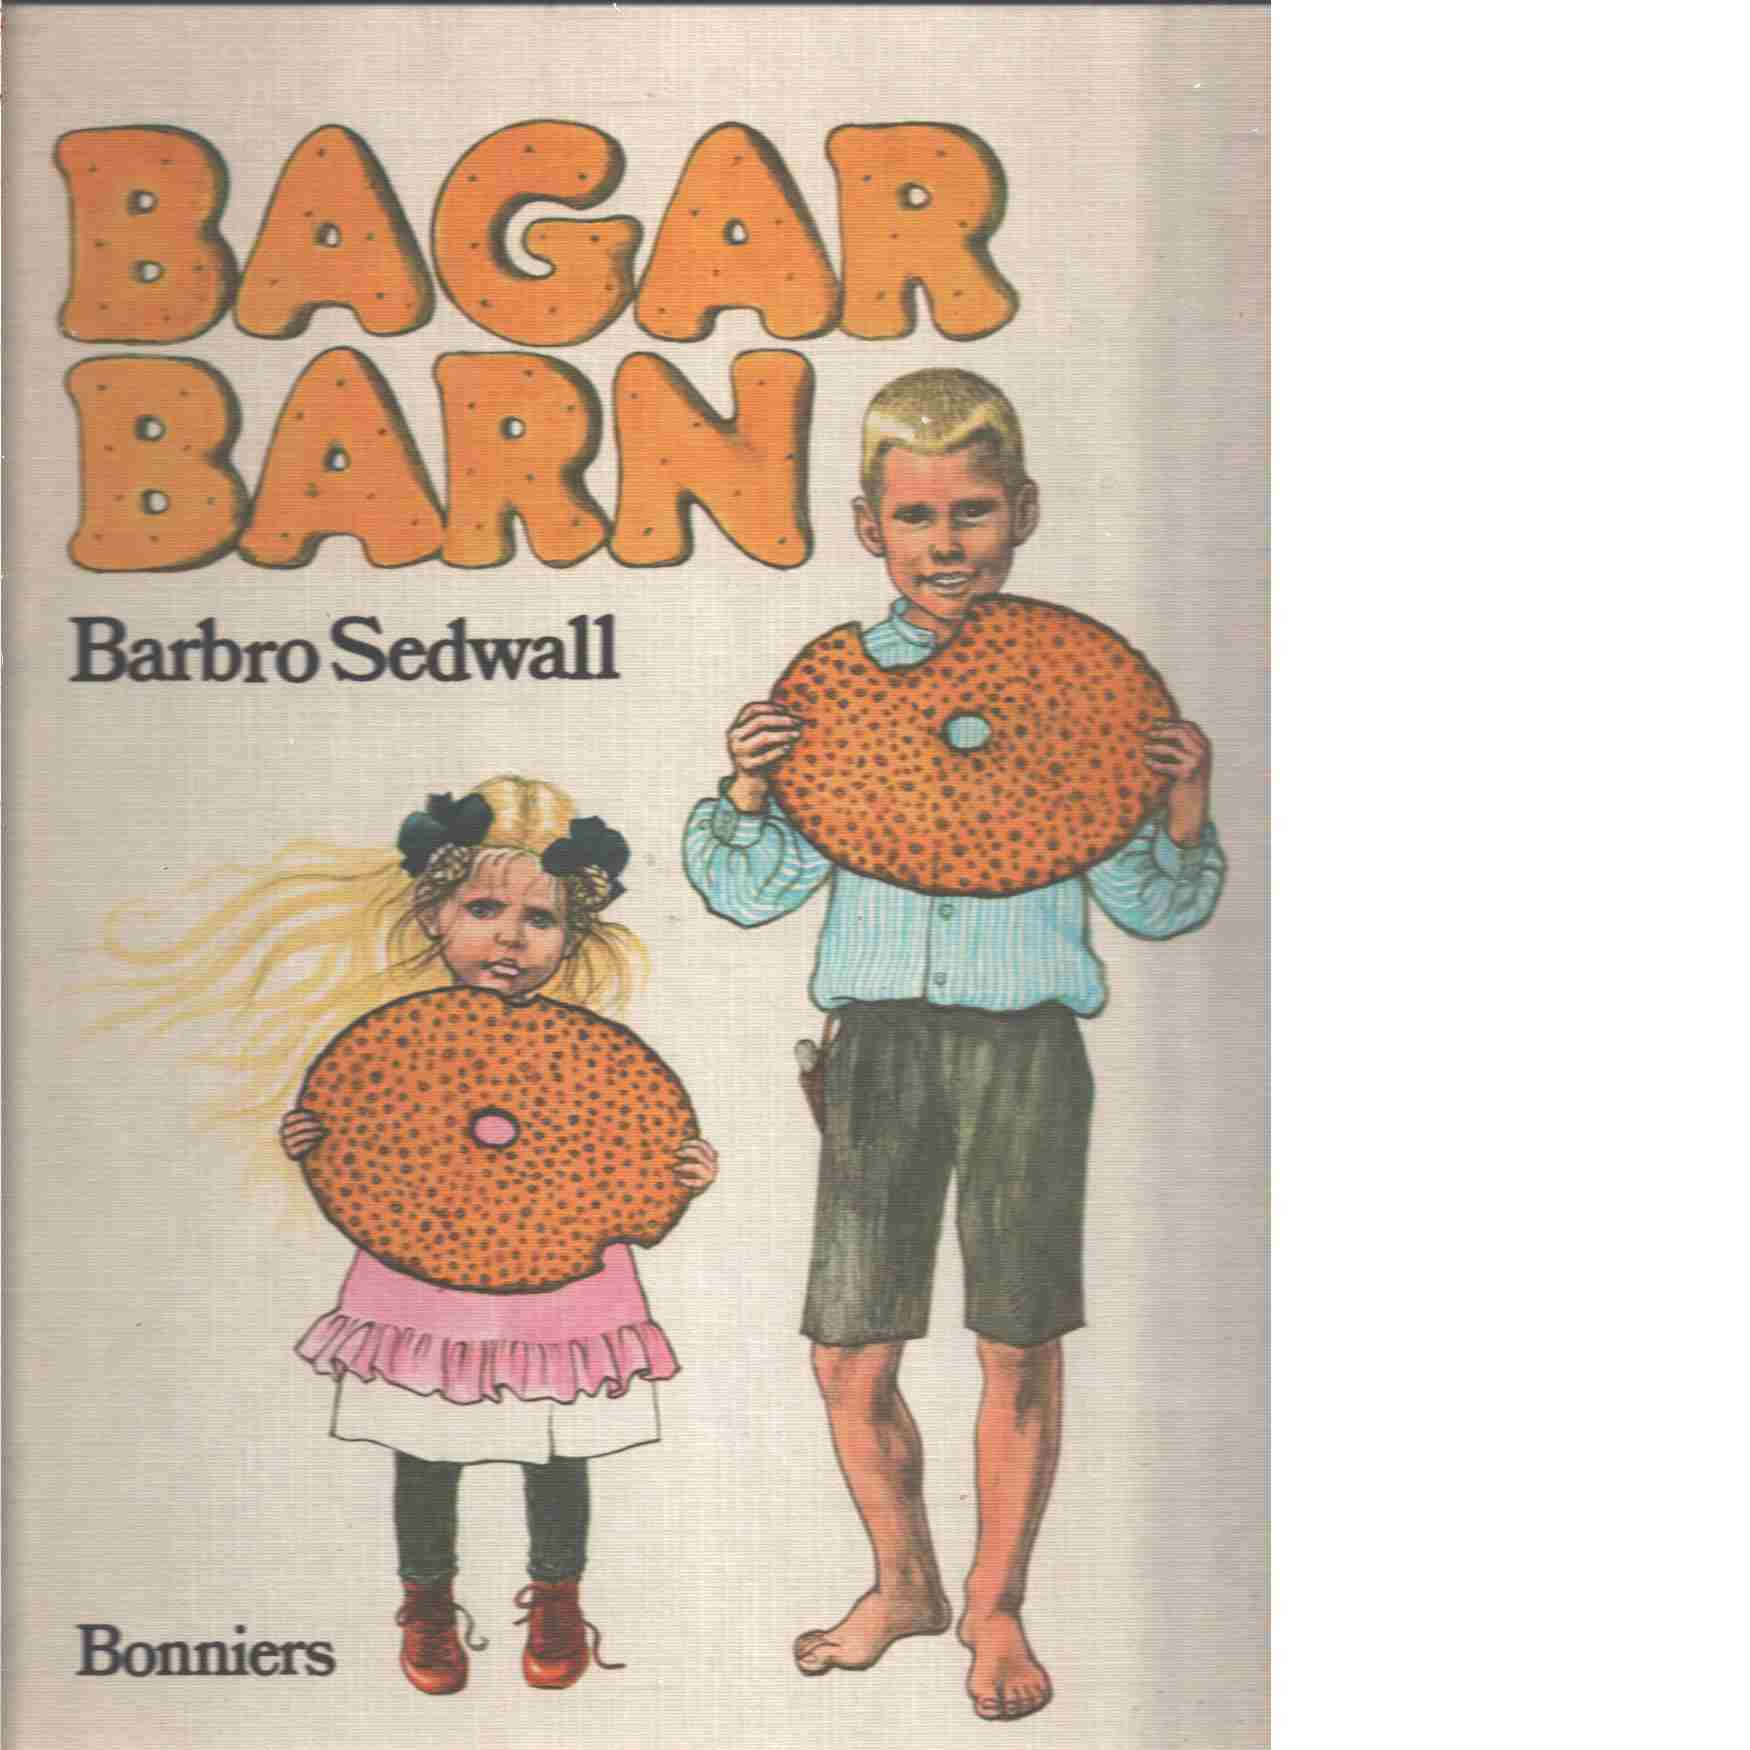 Bagarbarn - Sedwall, Barbro